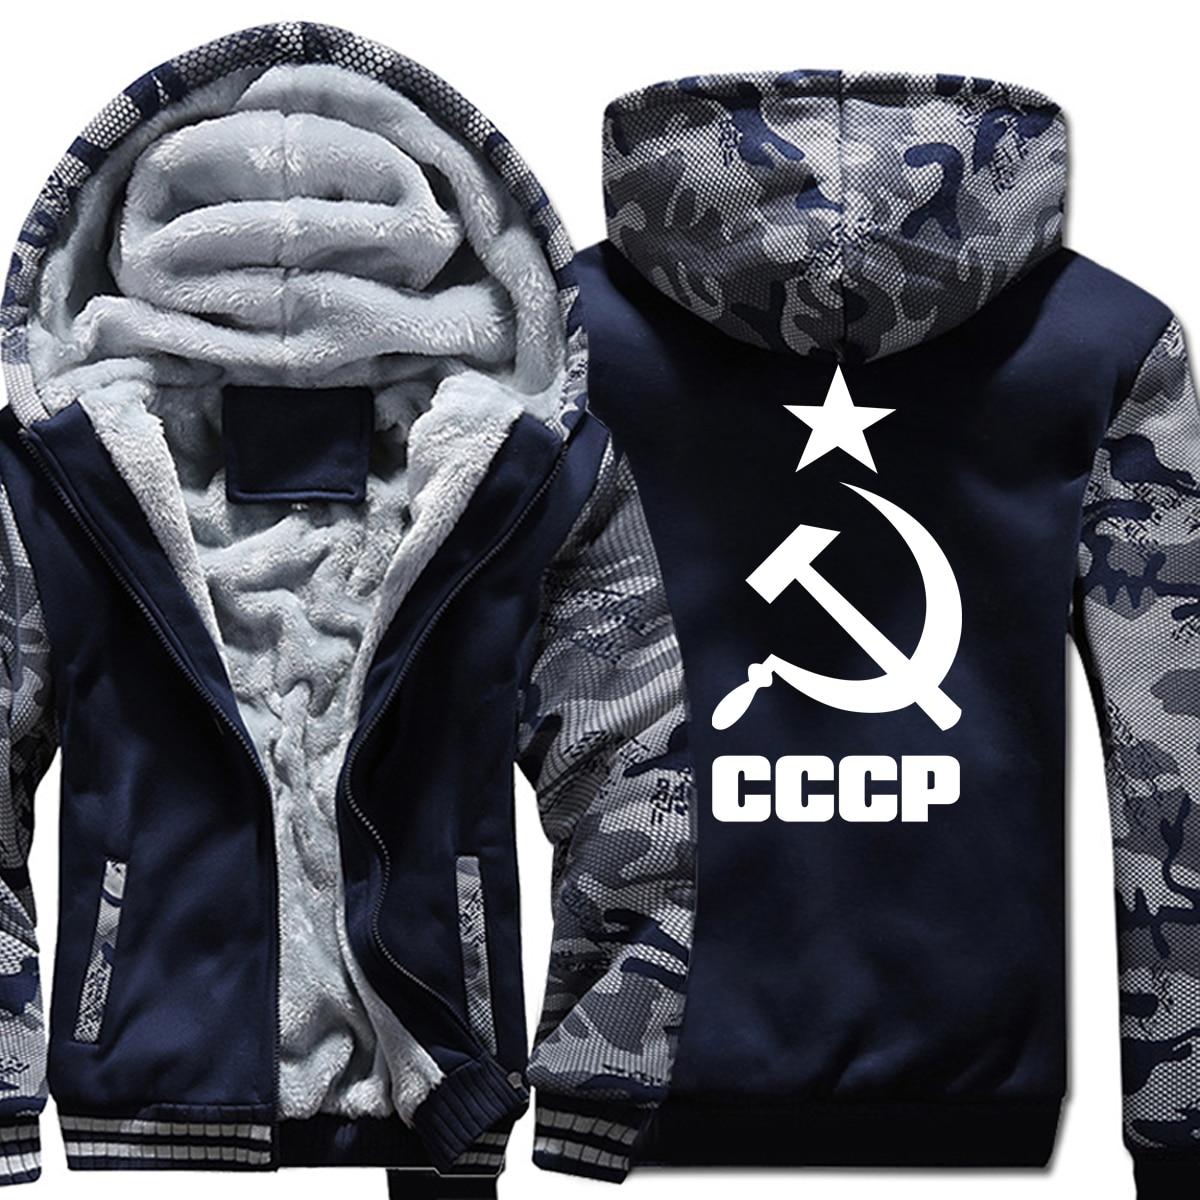 Men Sportswear 2019 Hot Printed Fleece Hoody USSR Soviet Union KGB Men Sweatshirt Hoodies Harajuku Tracksuits For Men Clothing